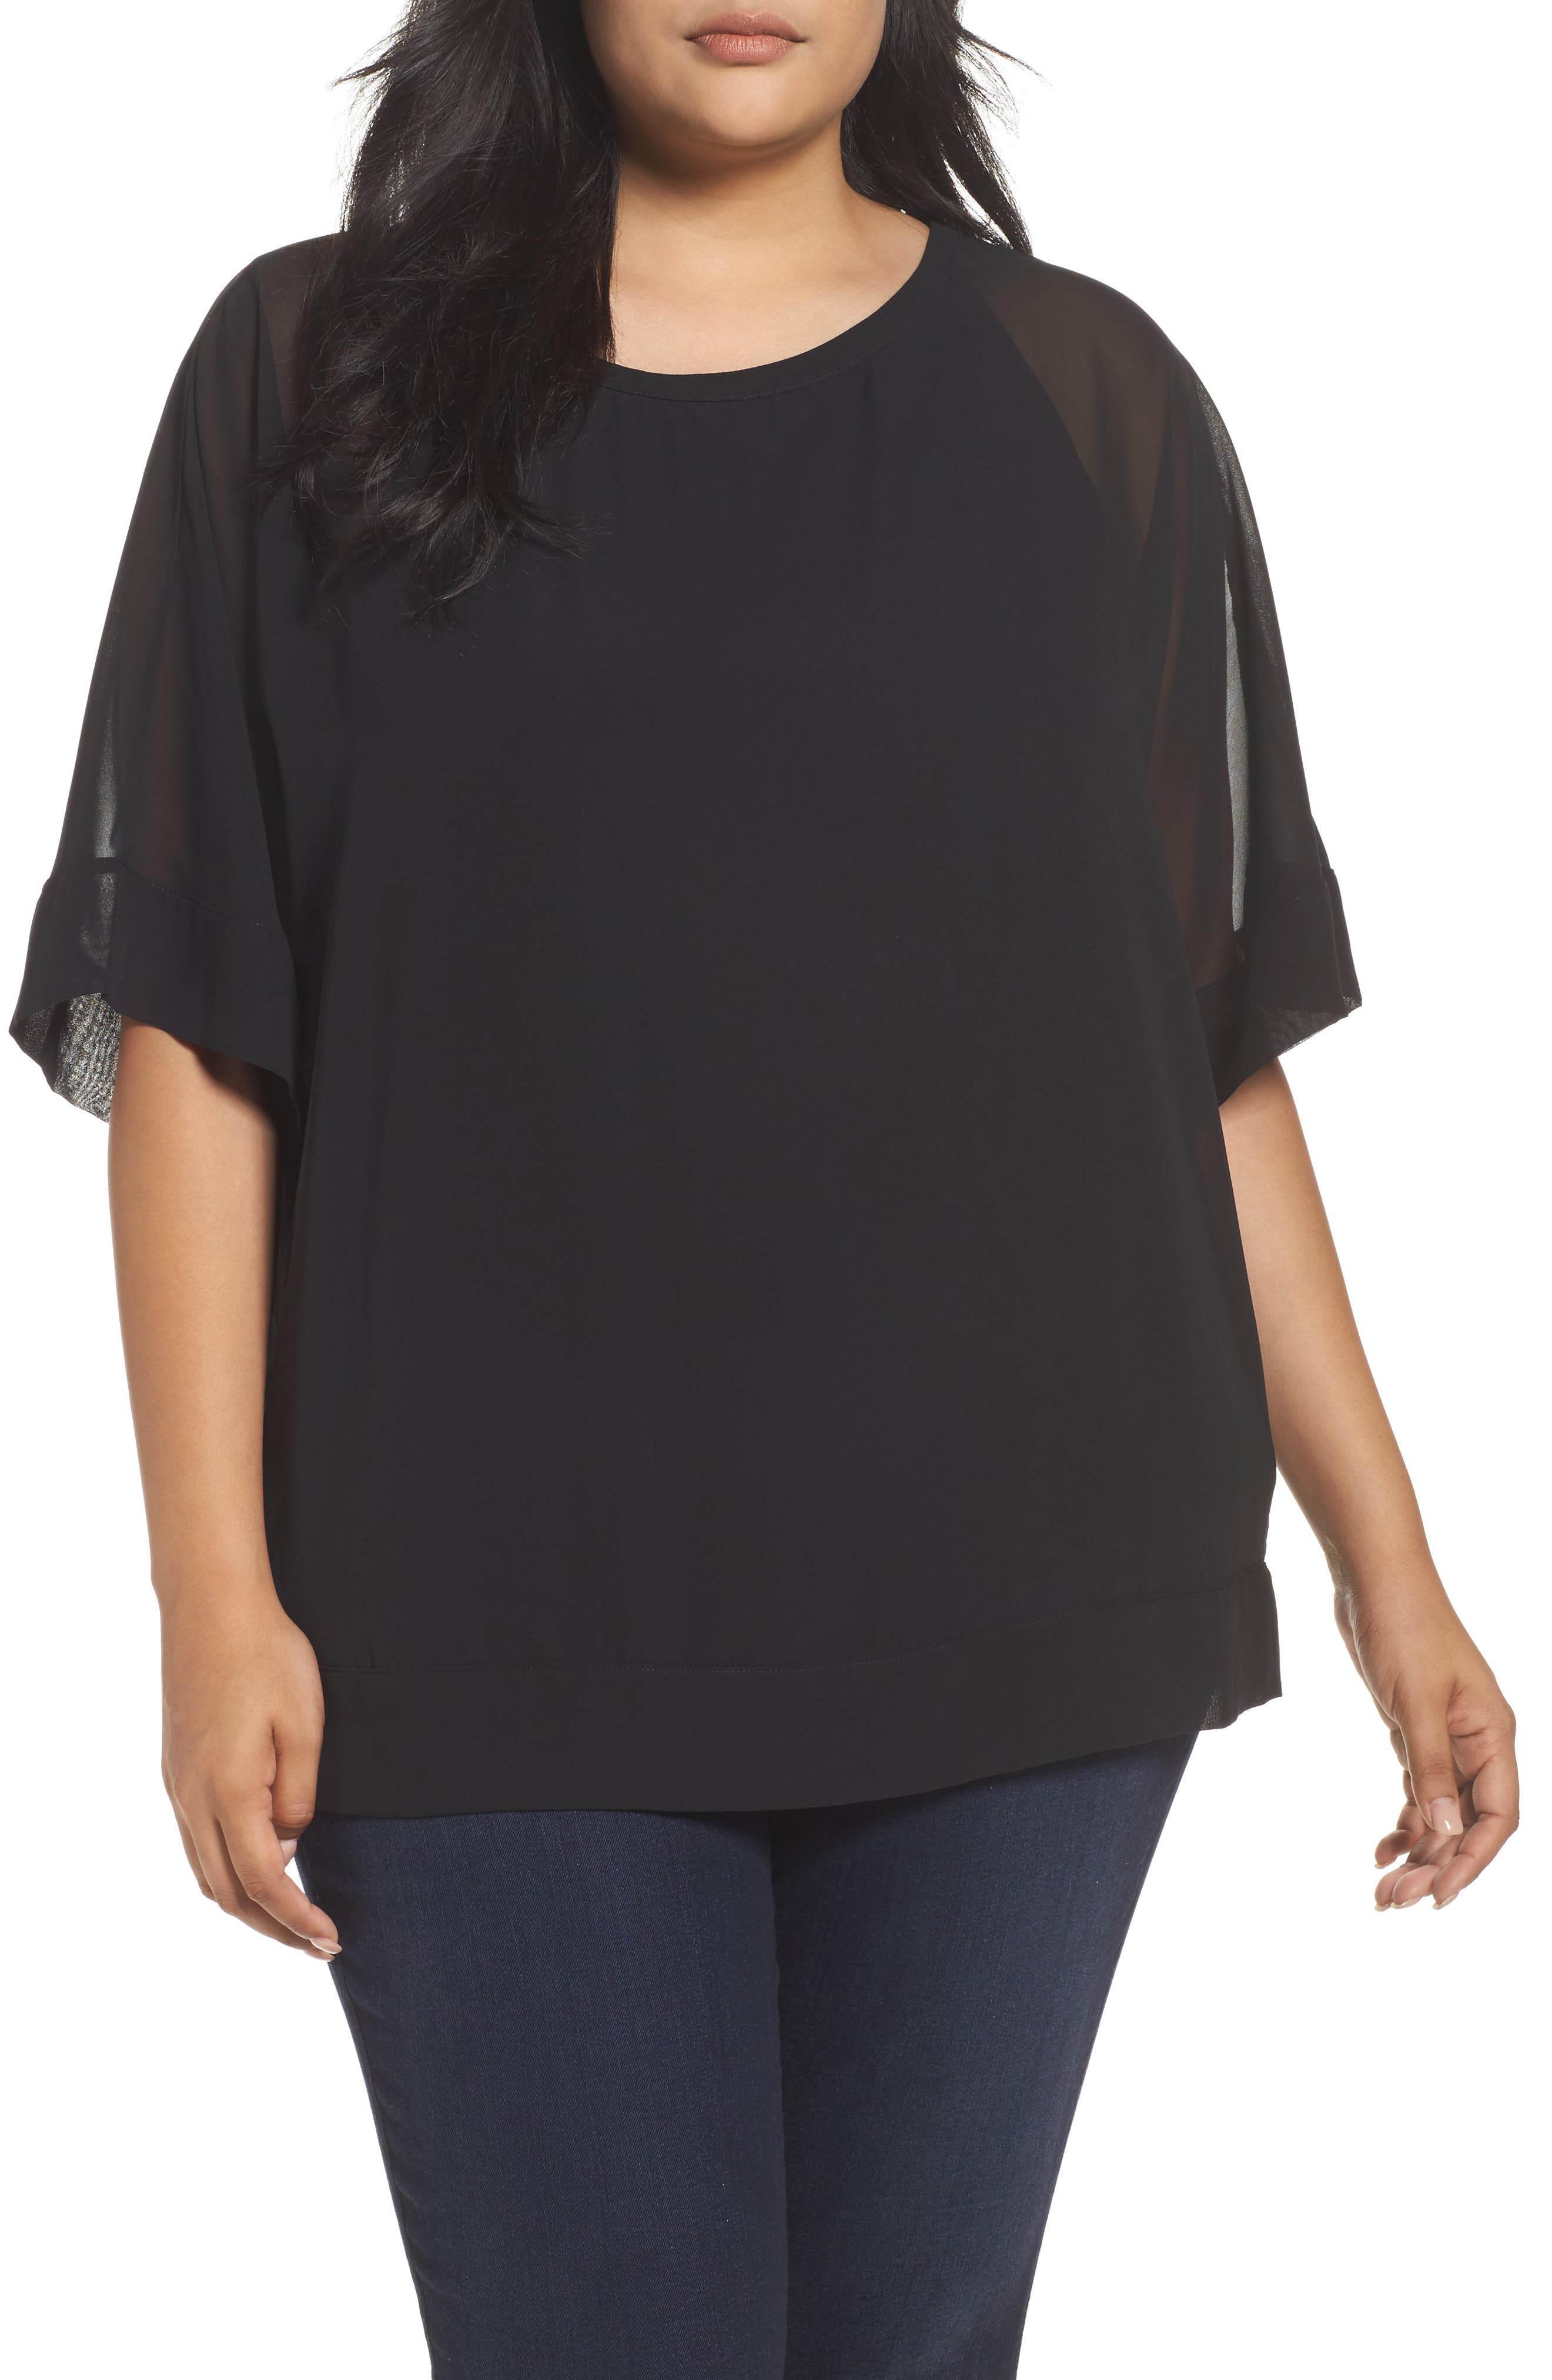 Alternate Image 1 Selected - Sejour Kimono Layered Top (Plus Size)